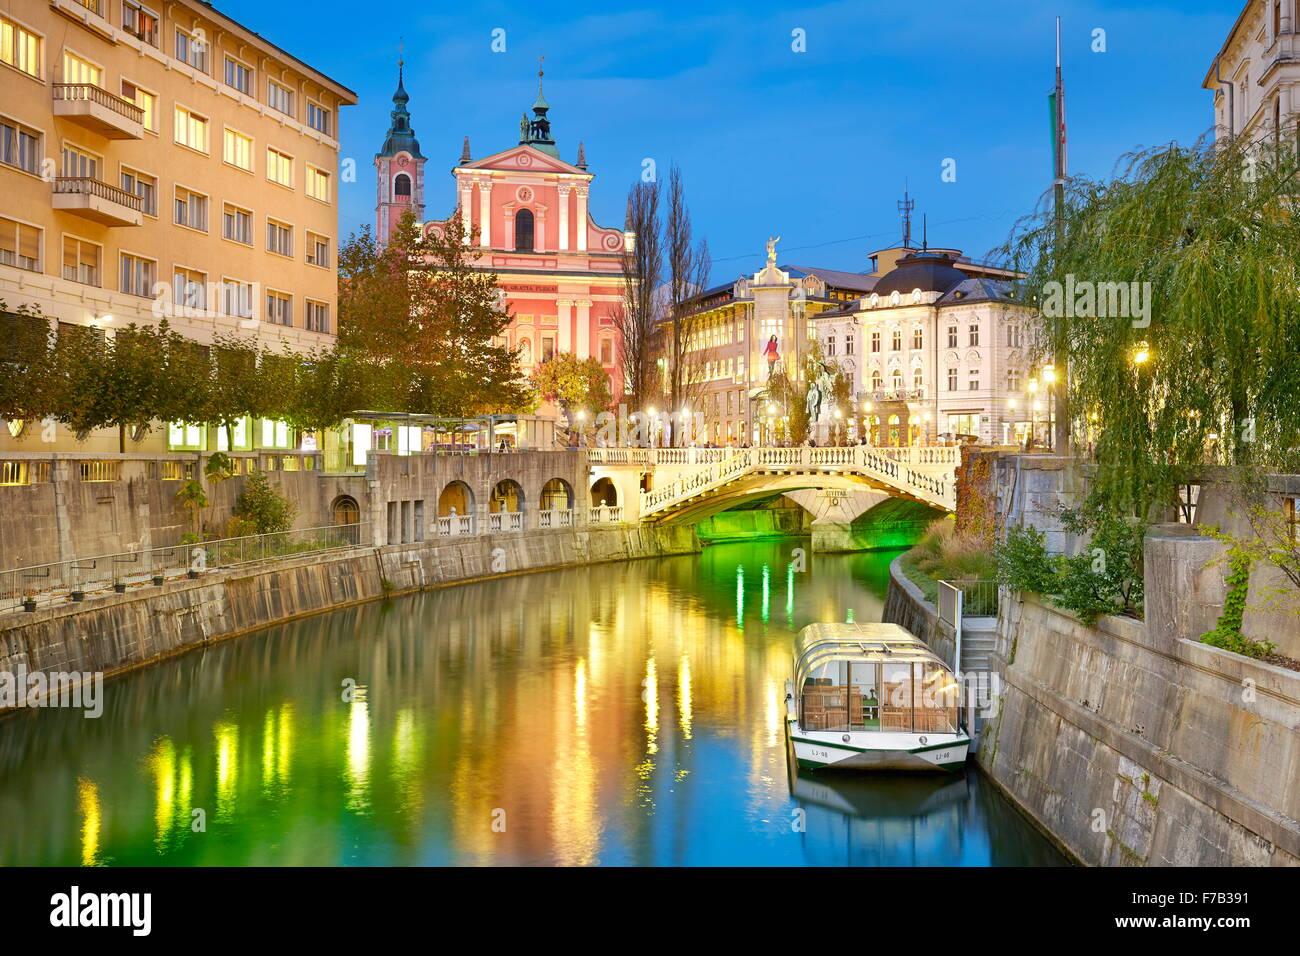 En Ljubljana, Eslovenia al atardecer. Imagen De Stock